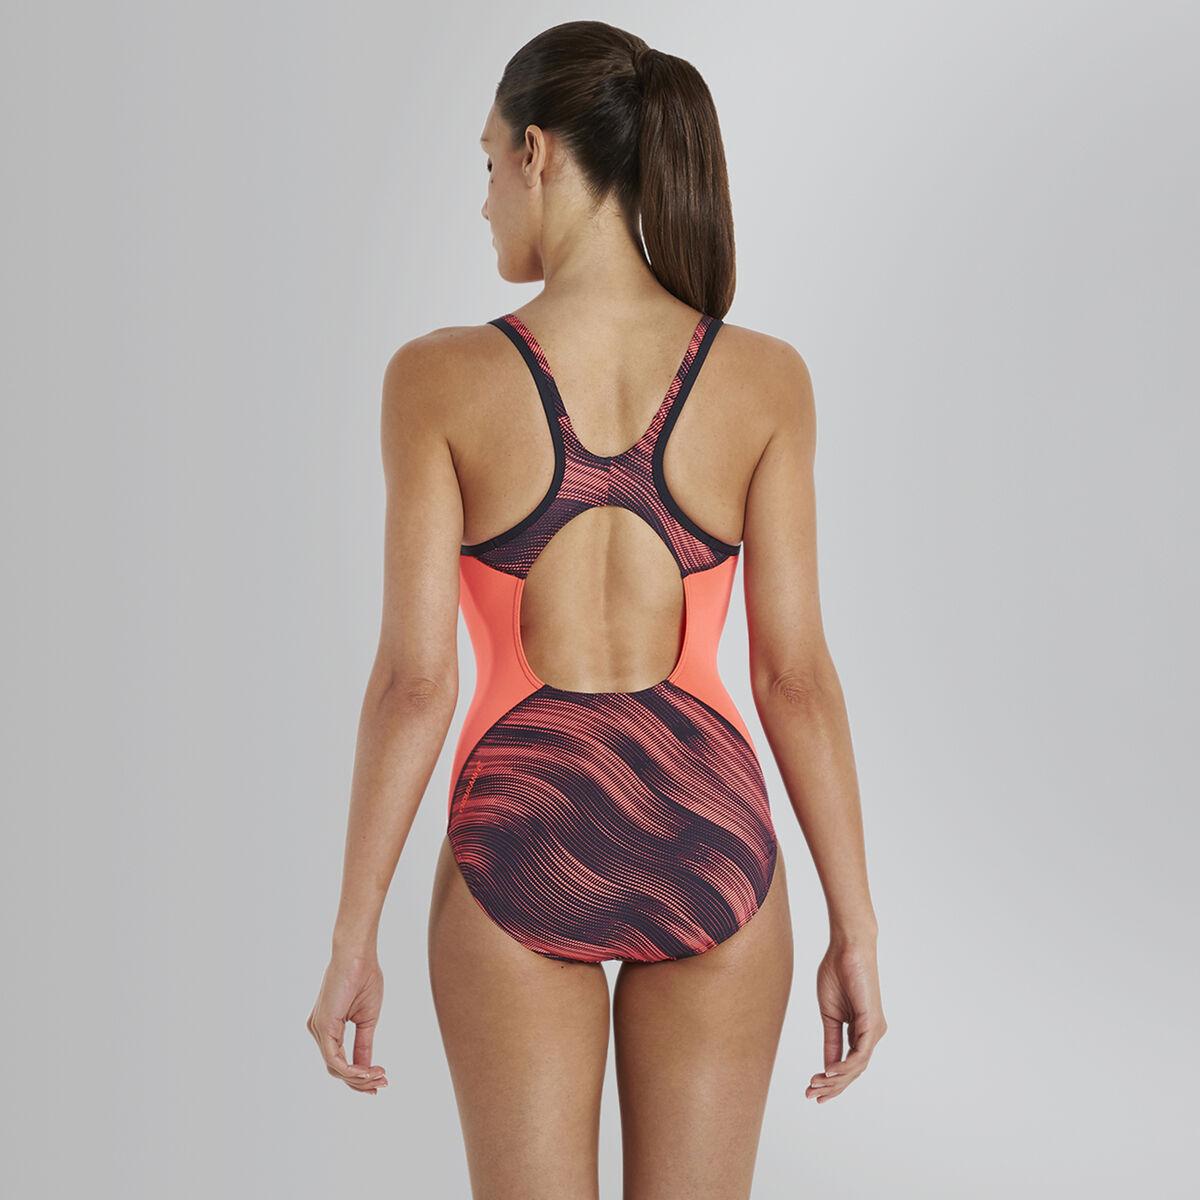 Speedo Fit Splice Allover Muscleback Swimsuit